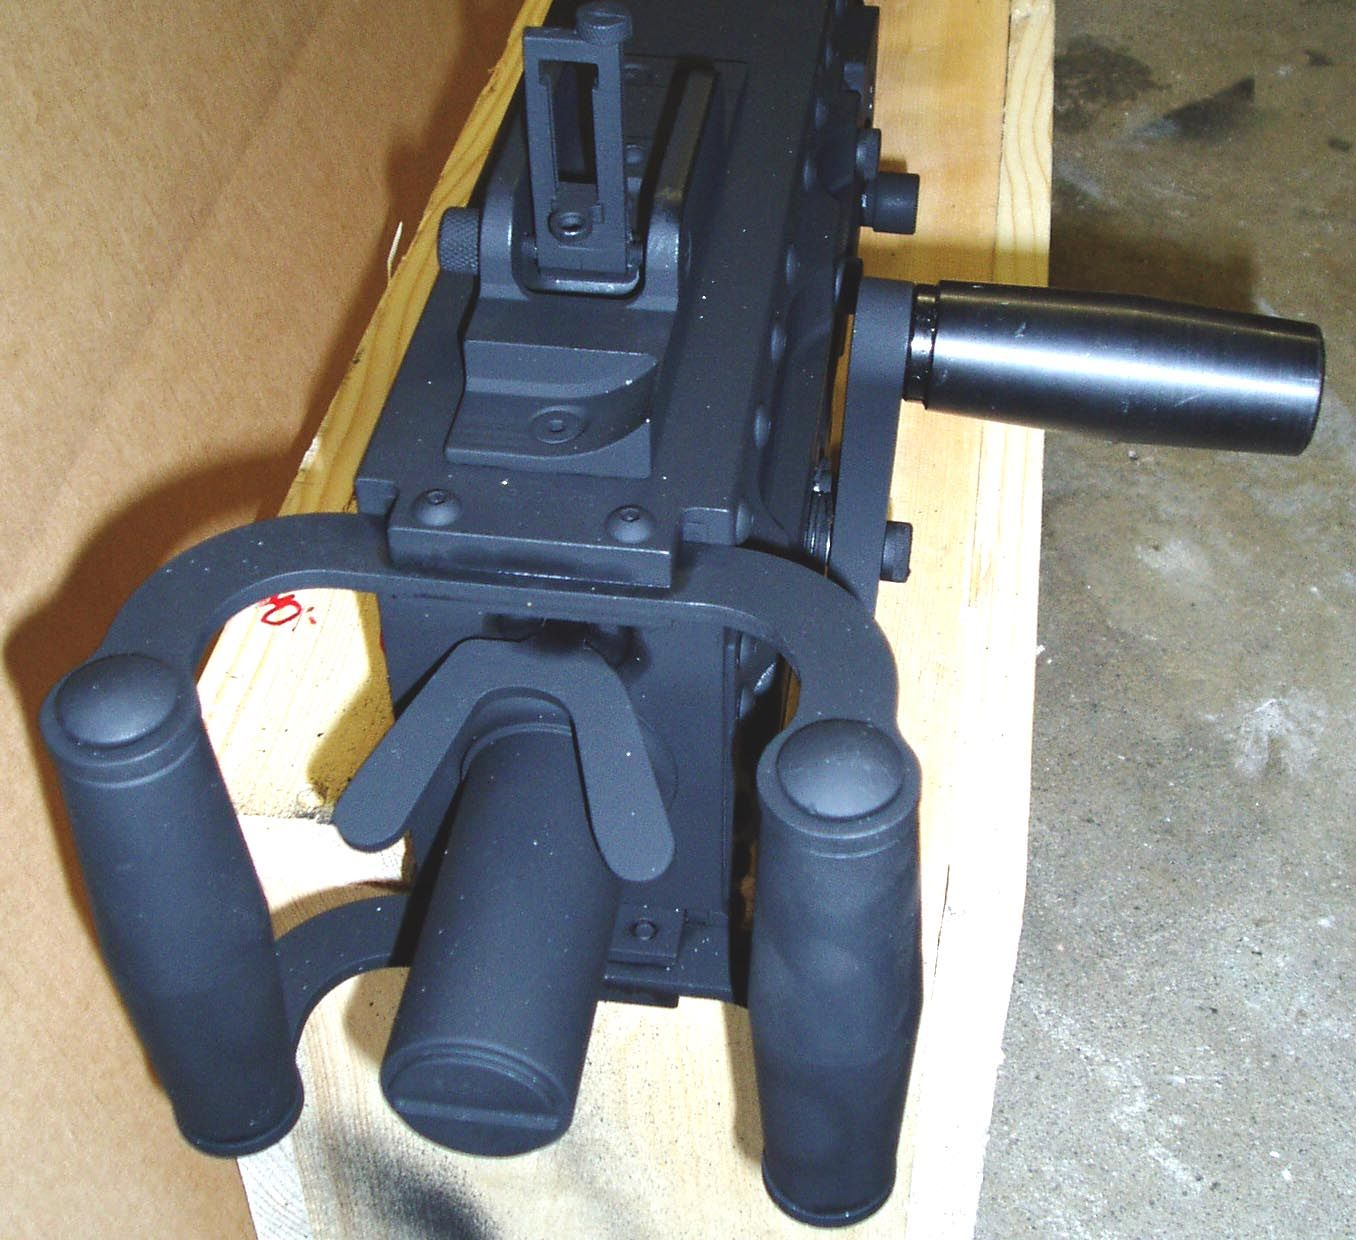 WWII Browning 50 cal blueprint - Google Search | guns